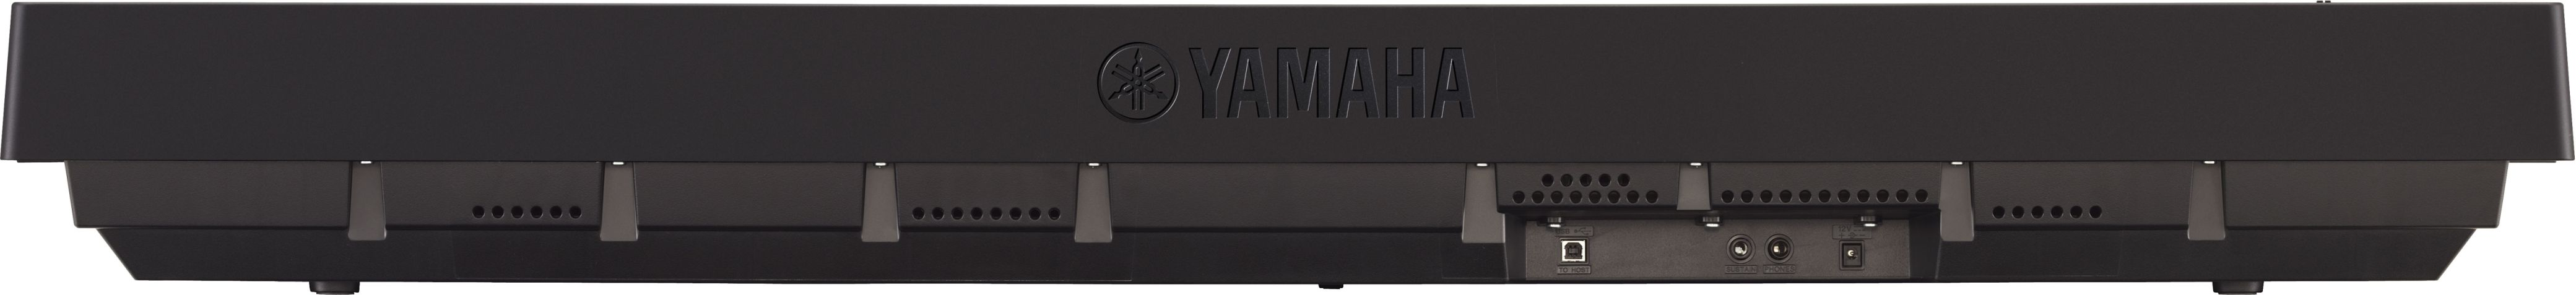 Yamaha P Demo Songs